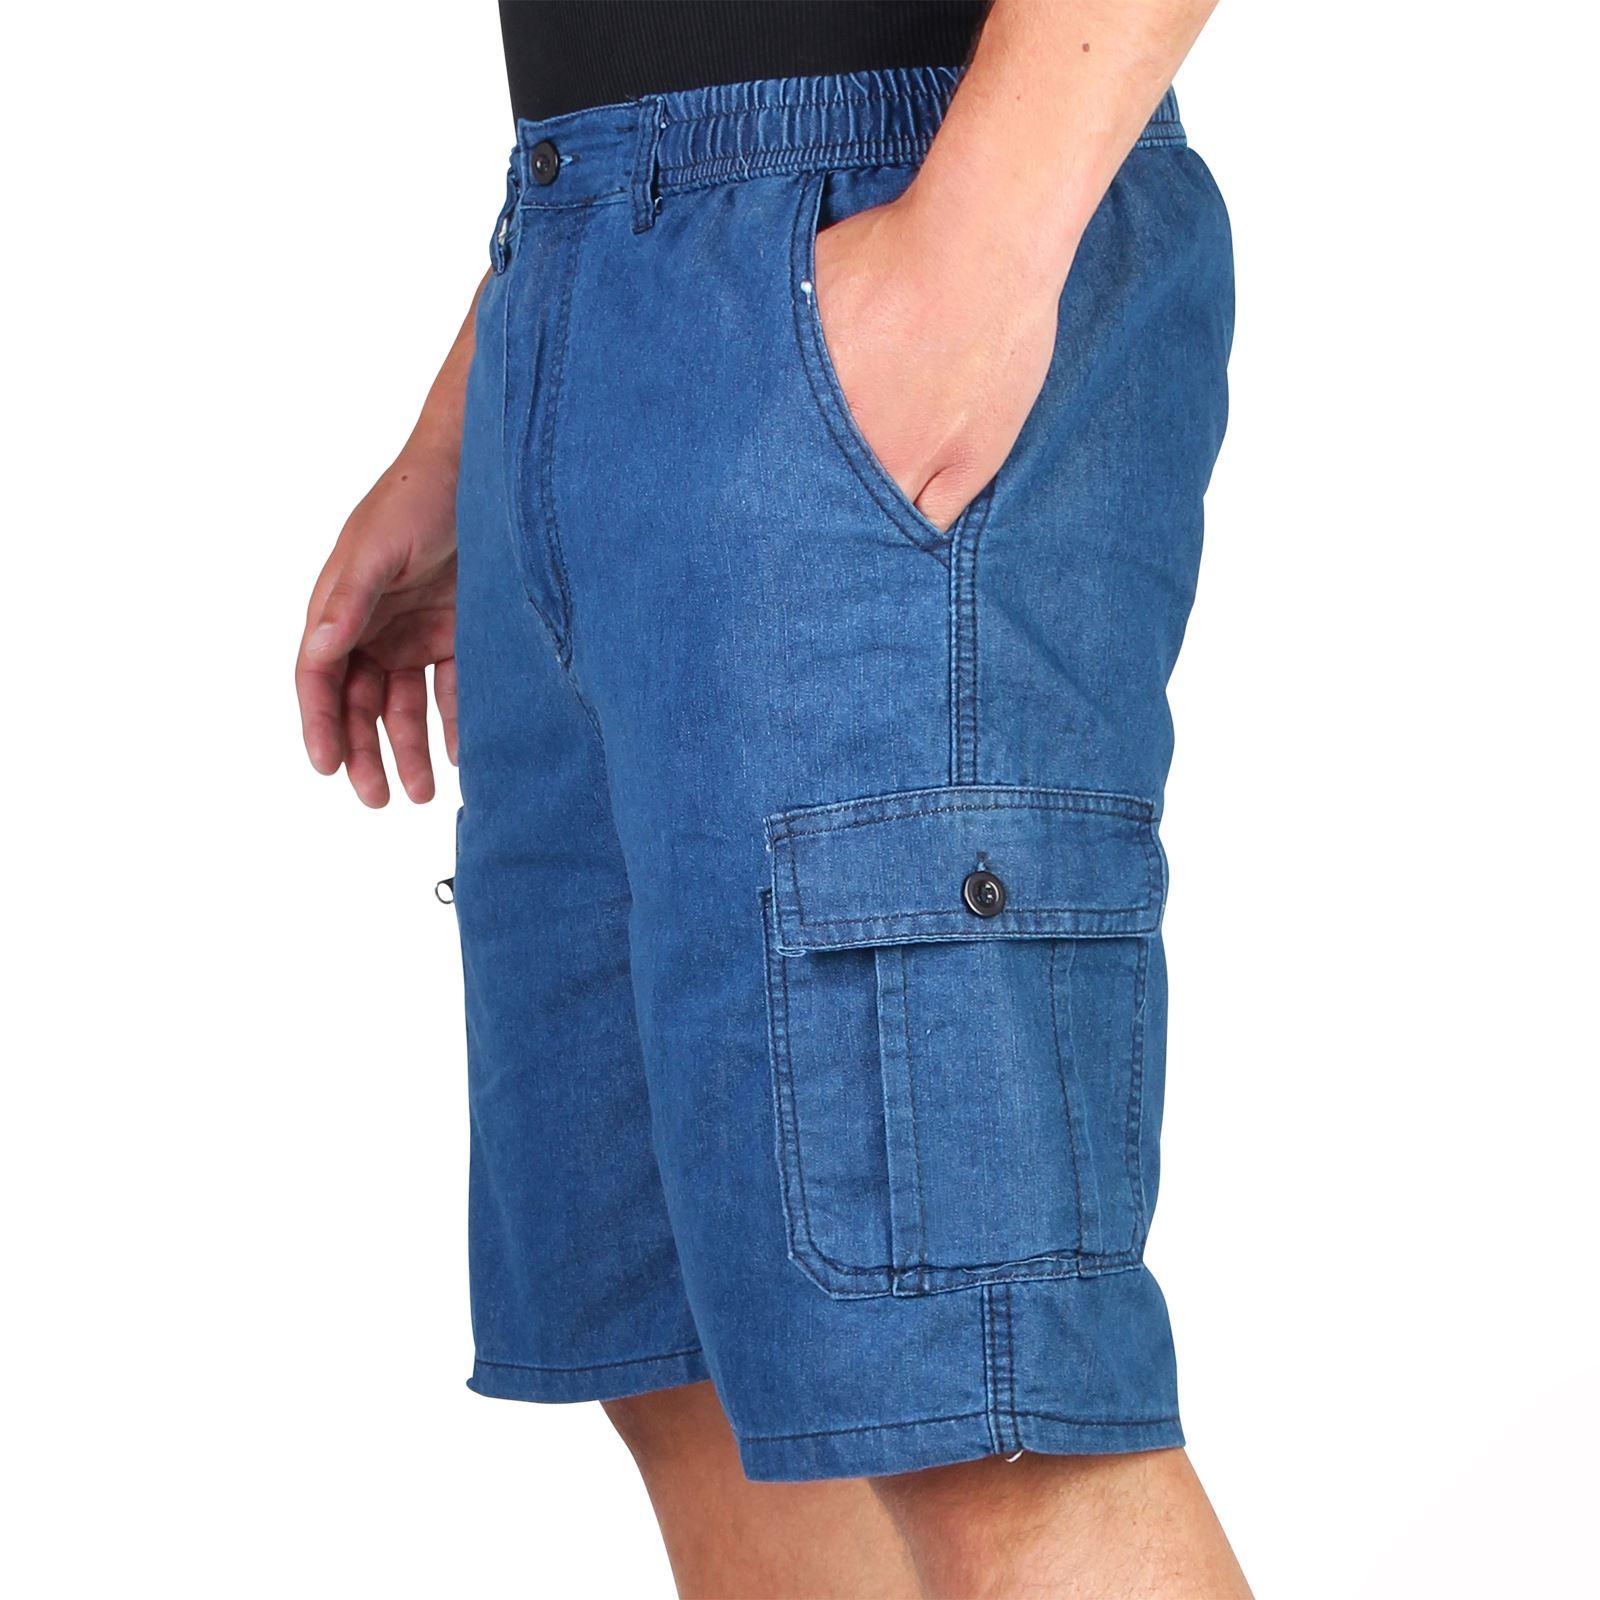 dc35a1f9835 Mens Vintage Classic Denim Shorts Cropped Cargo Jeans Combat Summer ...